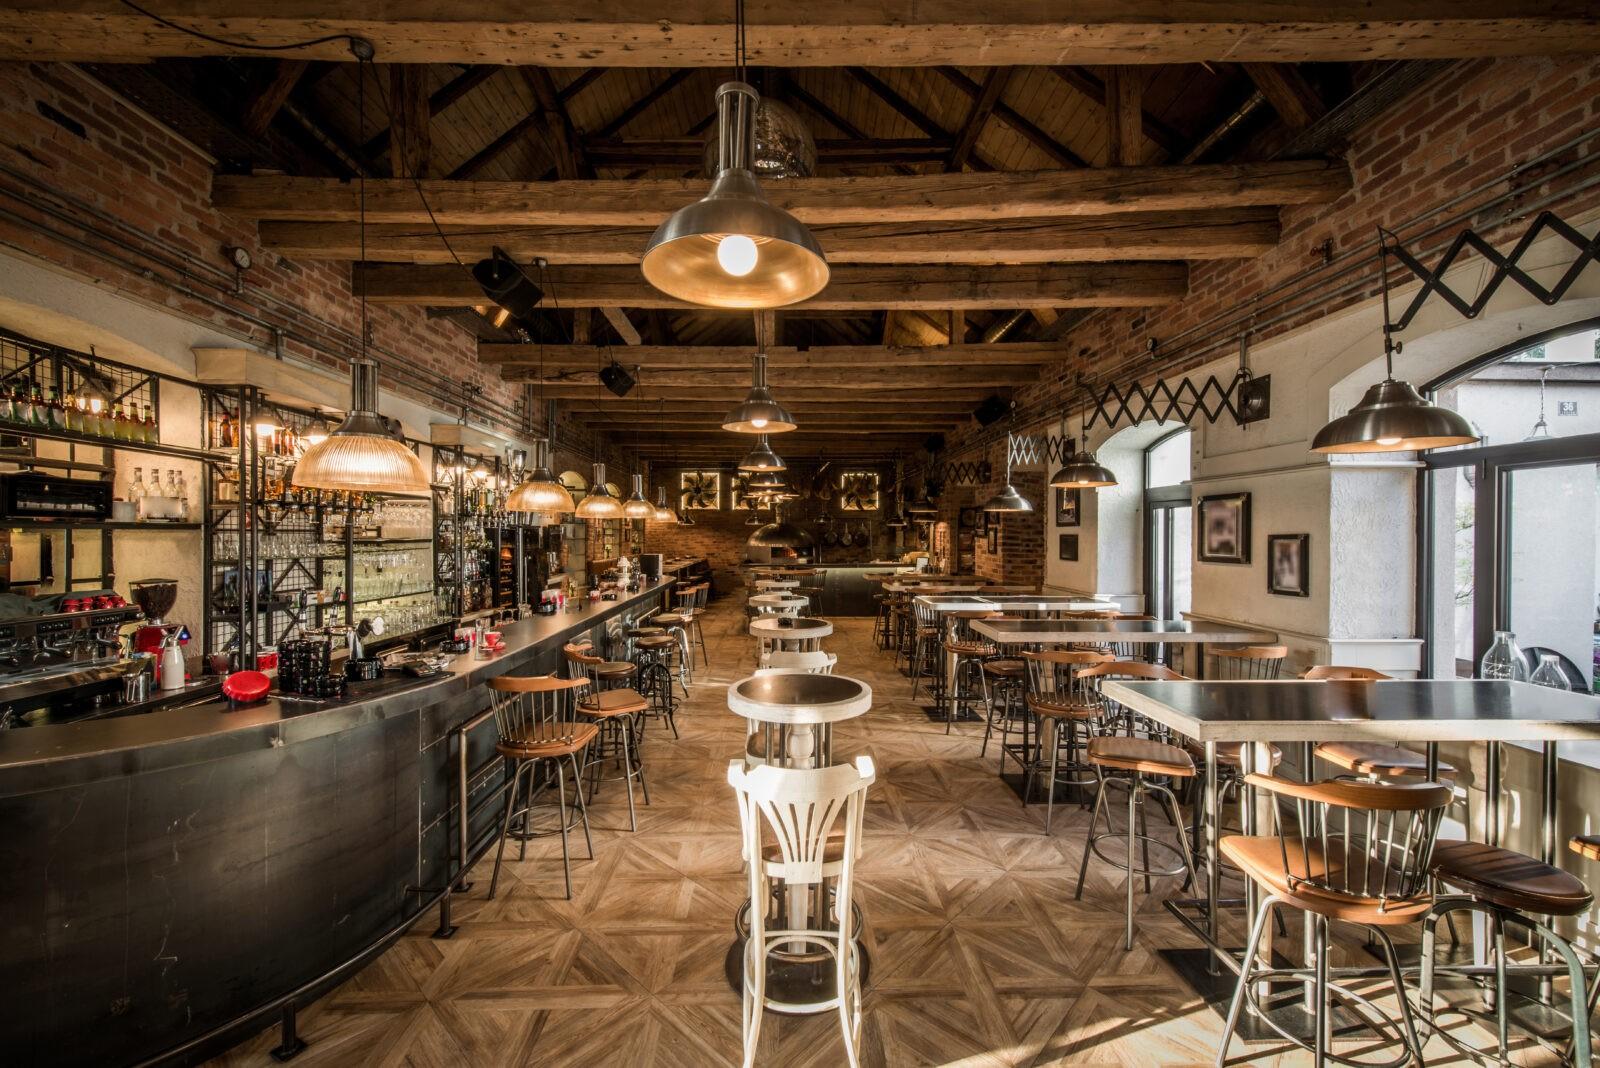 Turnkey Freestanding Hillcrest/Mission Hills Restaurant